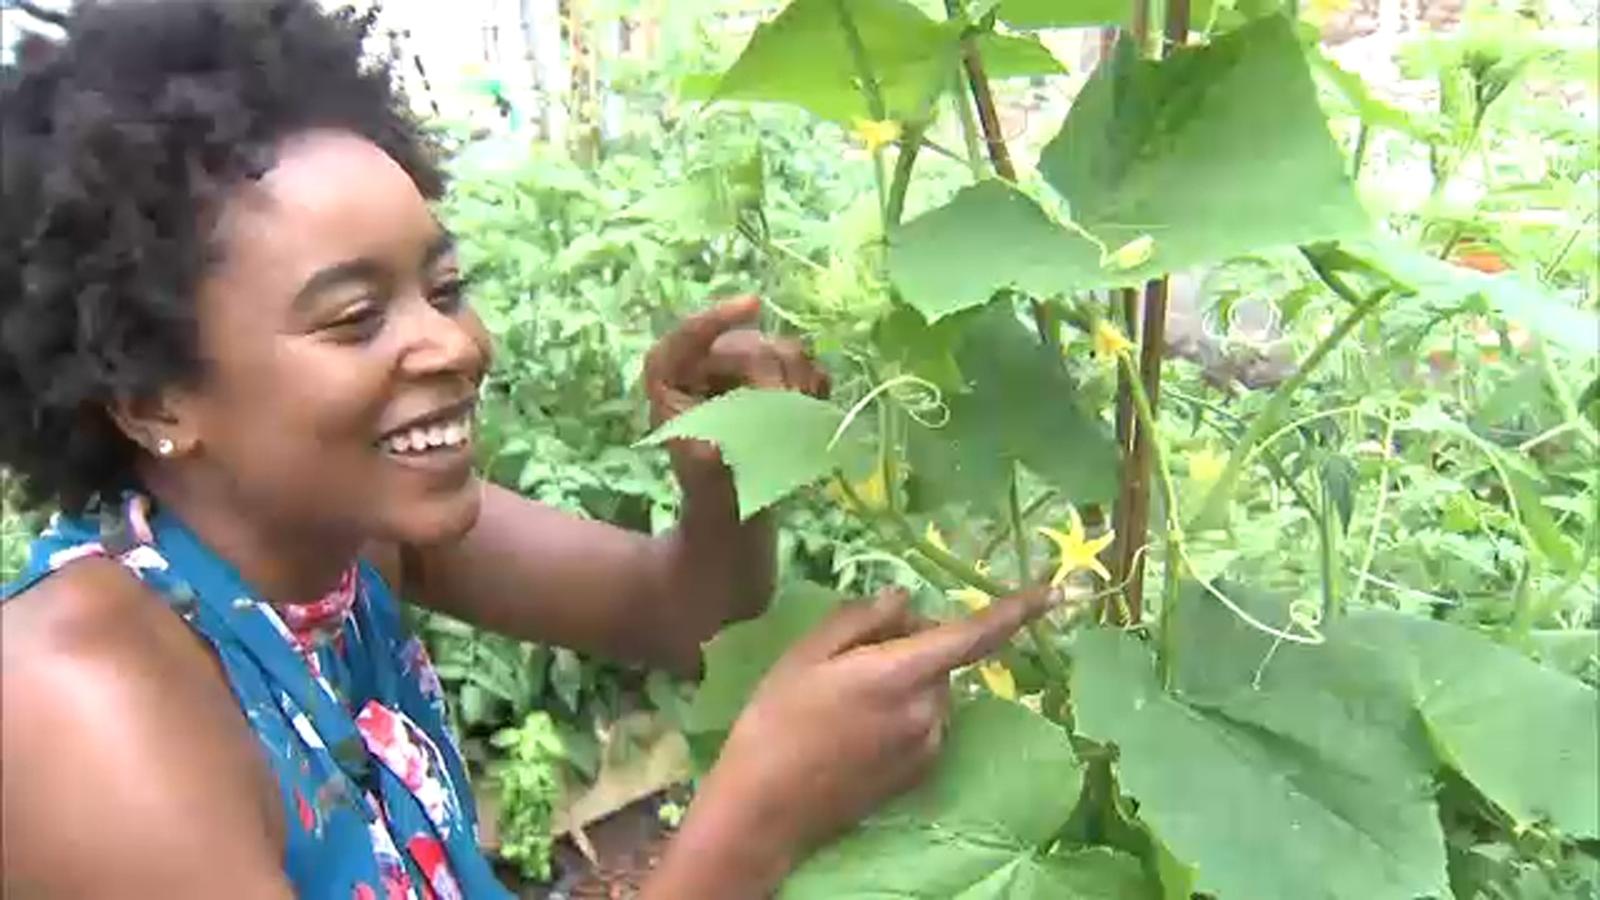 Coronavirus pandemic leads to new generation of plant, garden lovers